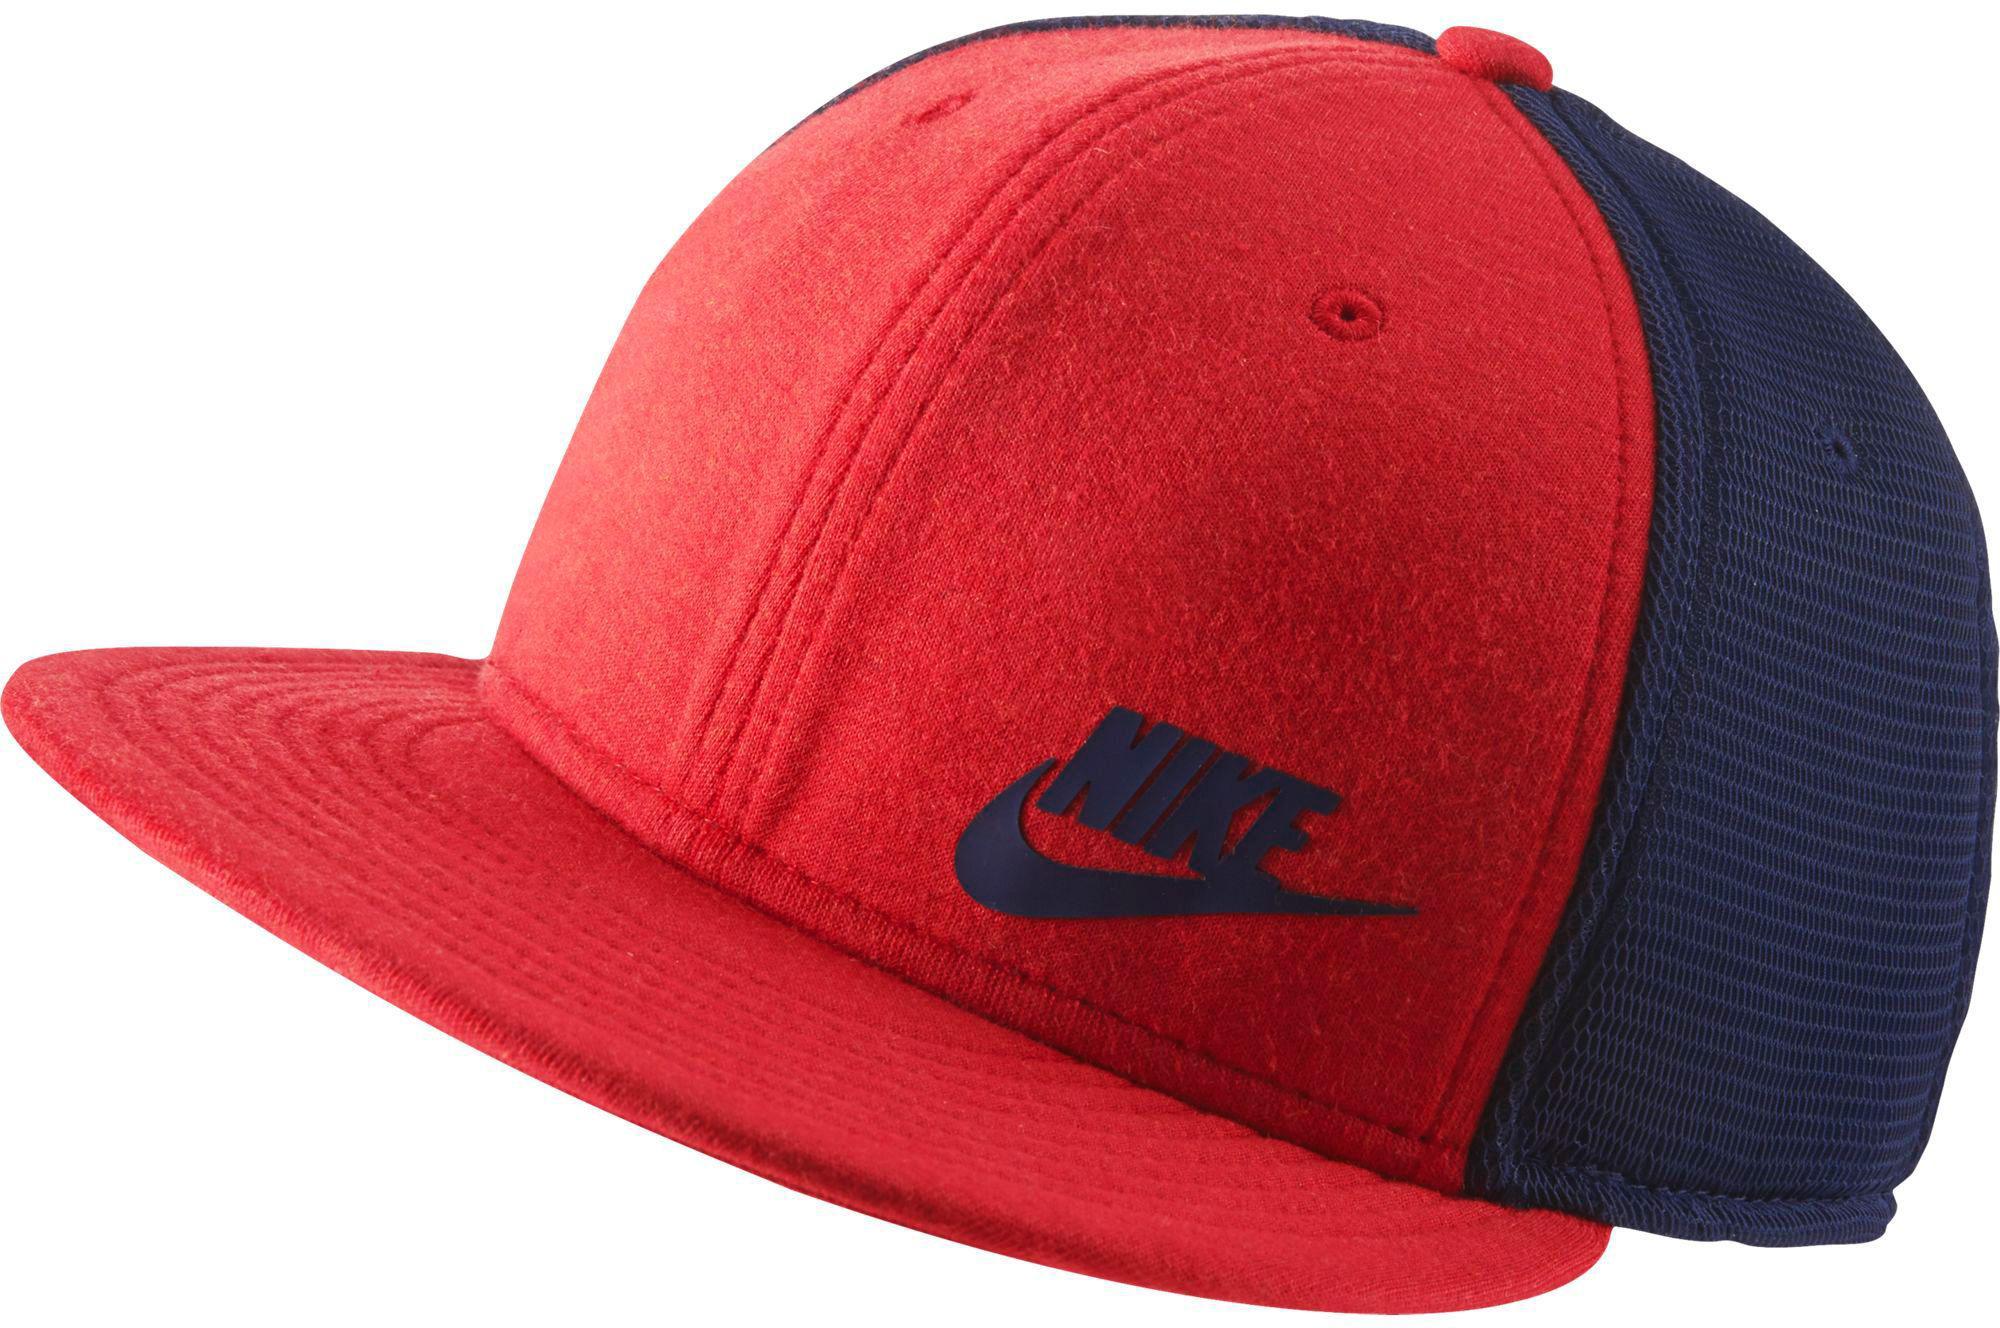 5179b4dc6 Nike Red True Tech Pack Adjustable Snapback Hat for men